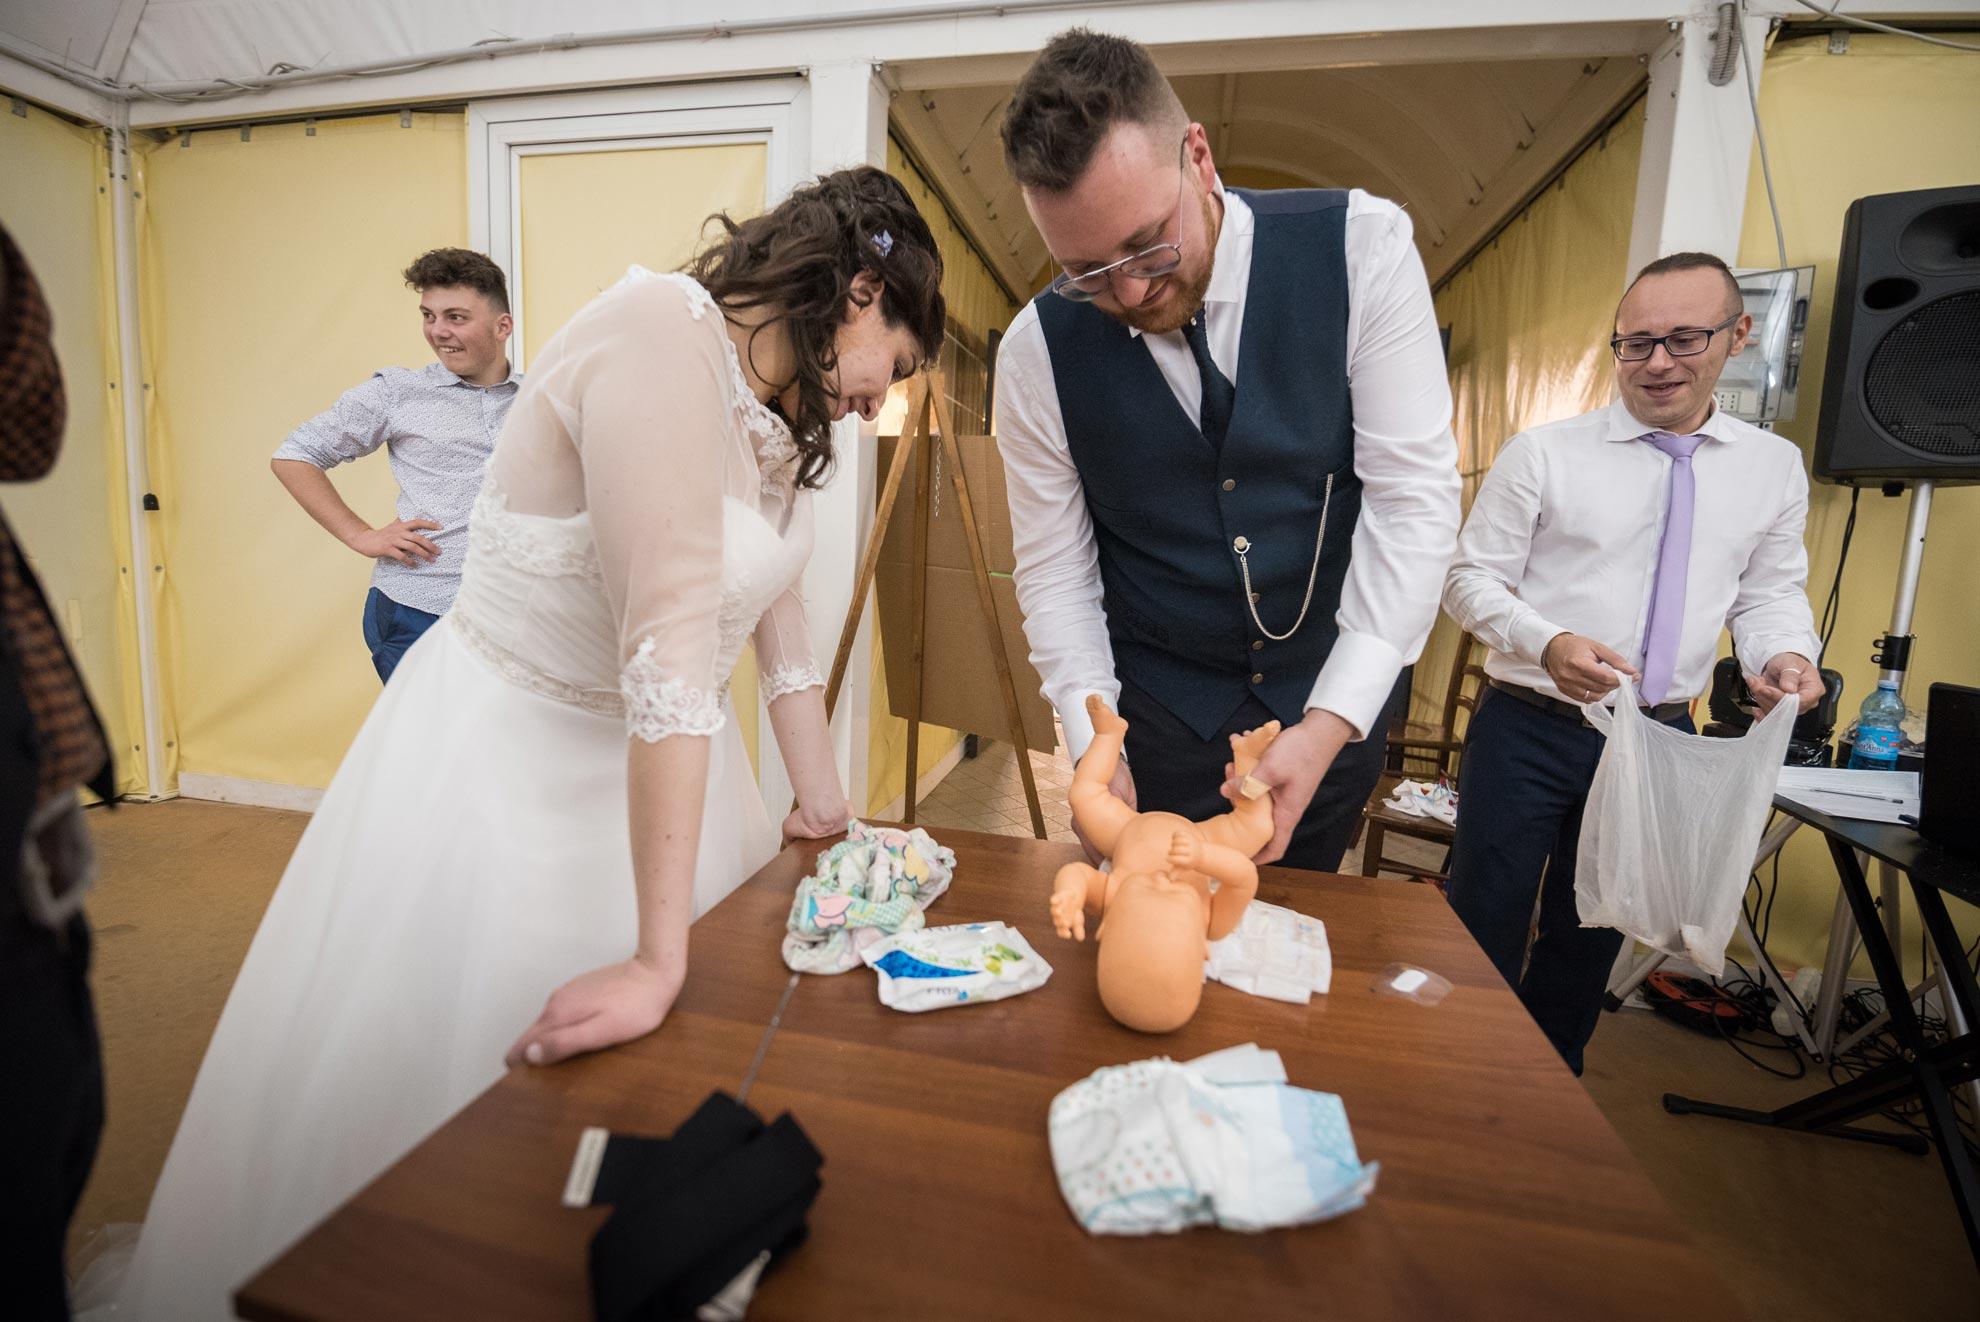 Matrimonio a Narzole Lorenza Diego - DSC 0881 - Fotografo matrimonio scherzi matrimonio - Fotografo matrimonio scherzi matrimonio